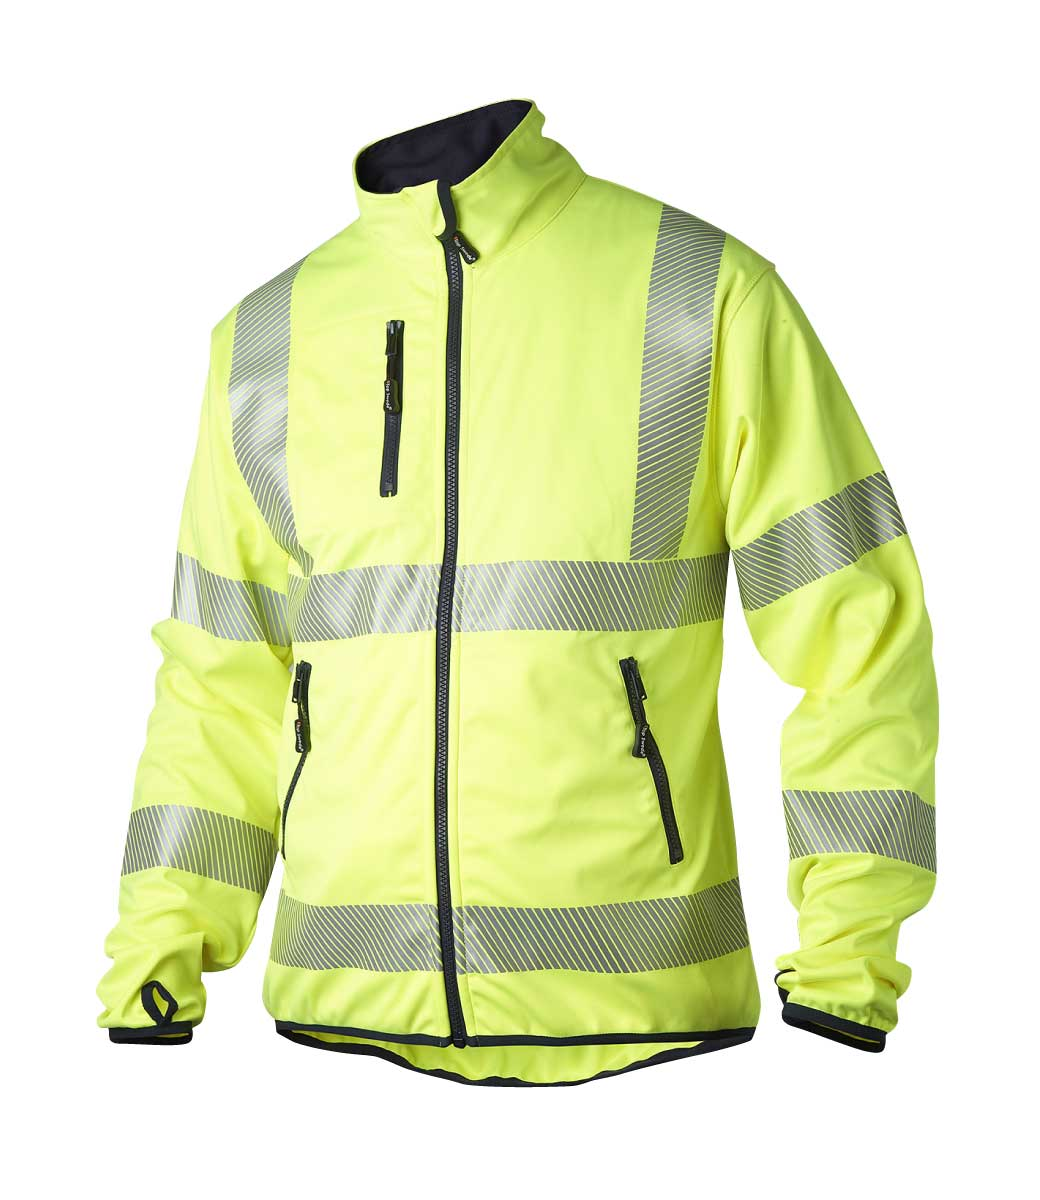 Gul jakke med 3M refleksbånd ~ Ezzenza.no Arbeidsklær